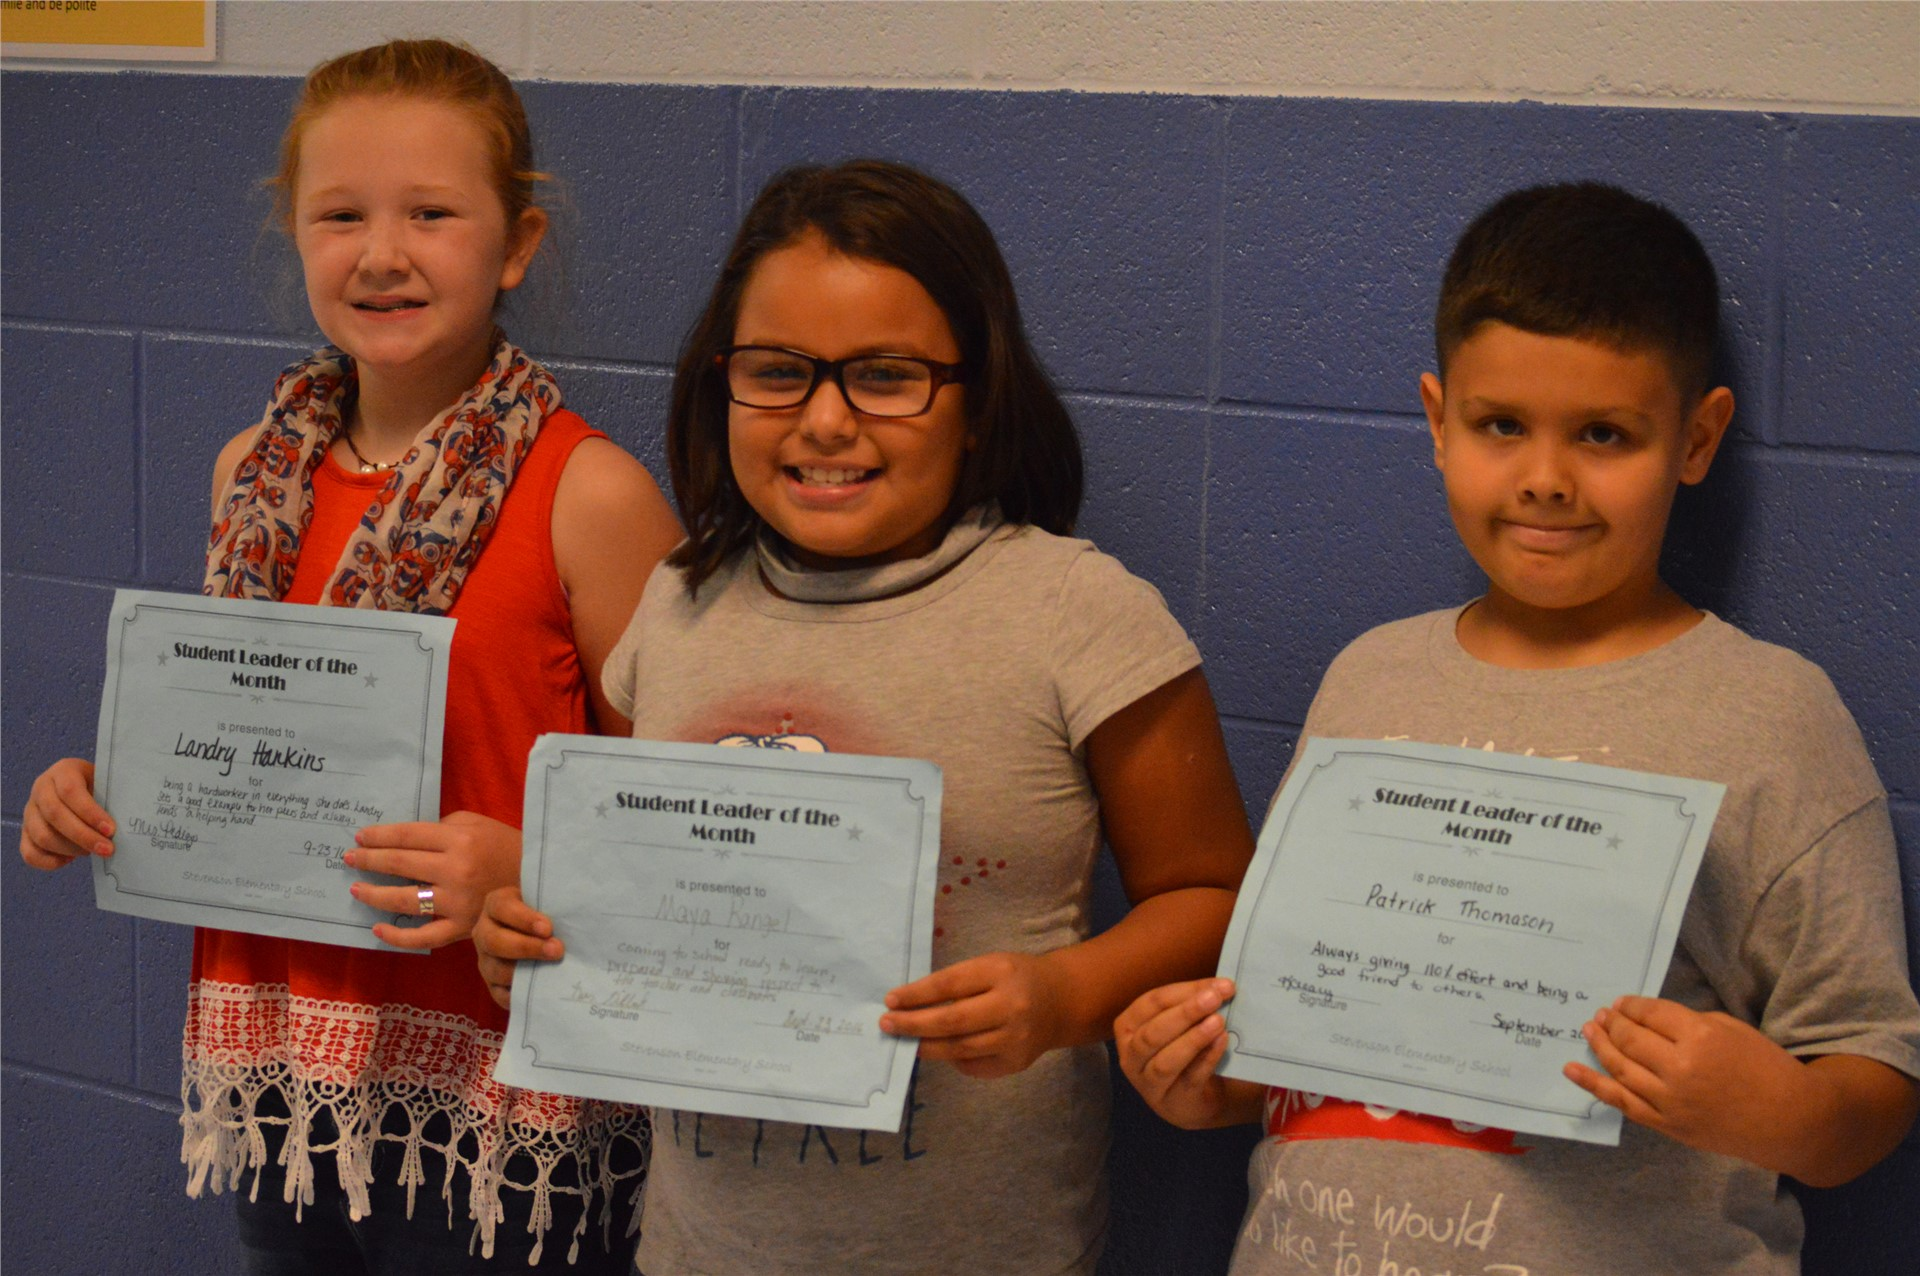 (L-R) 3rd Graders:  Landry Hankins, Maya Rangel, Patrick Thomason